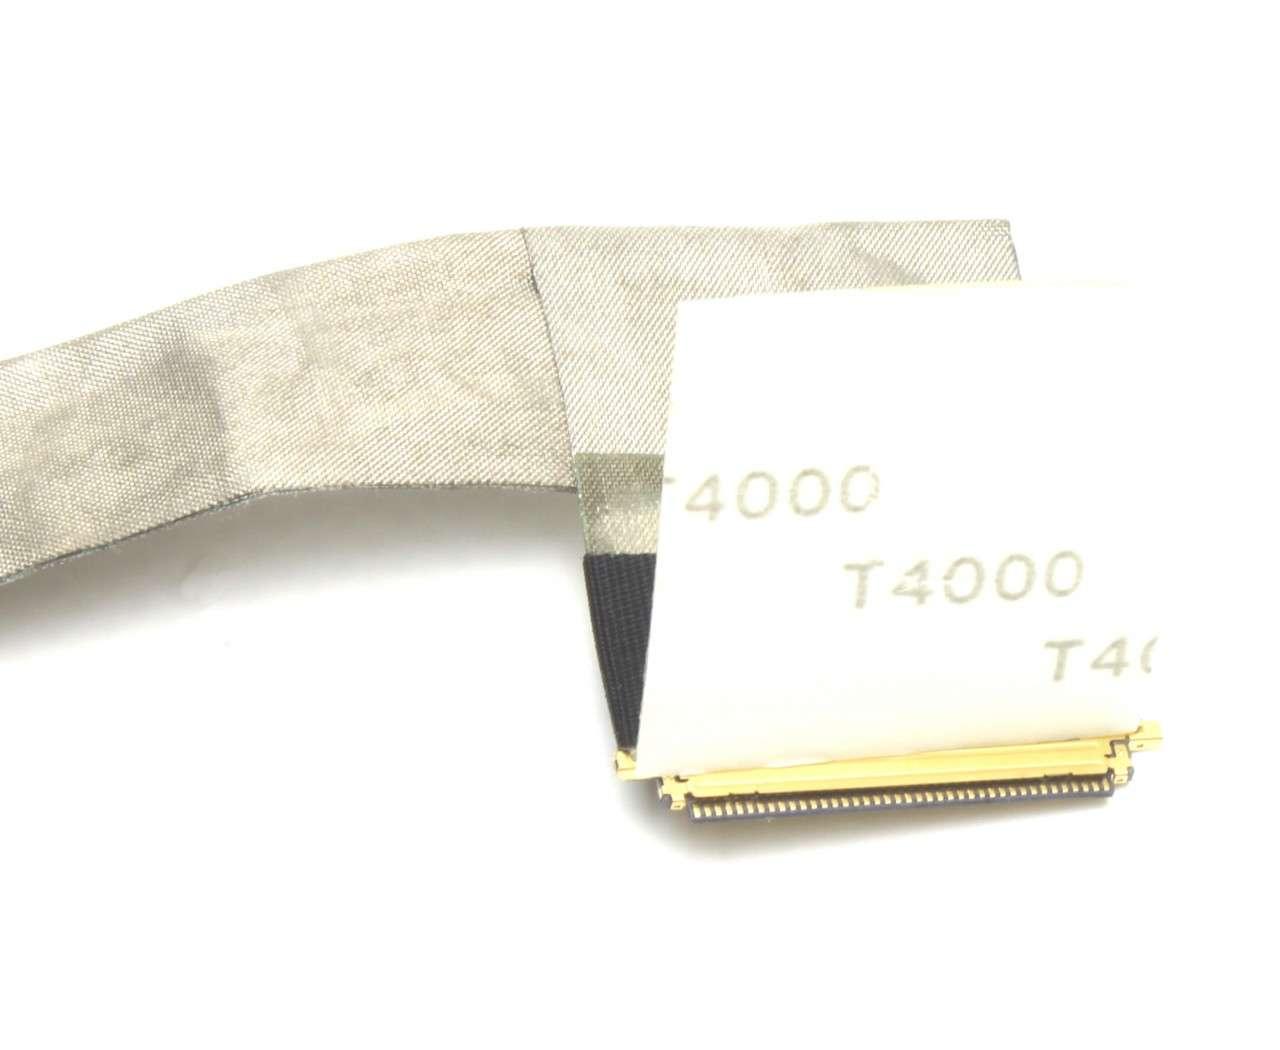 Cablu video LVDS Acer 50 4CG1 001 cu touchscreen imagine